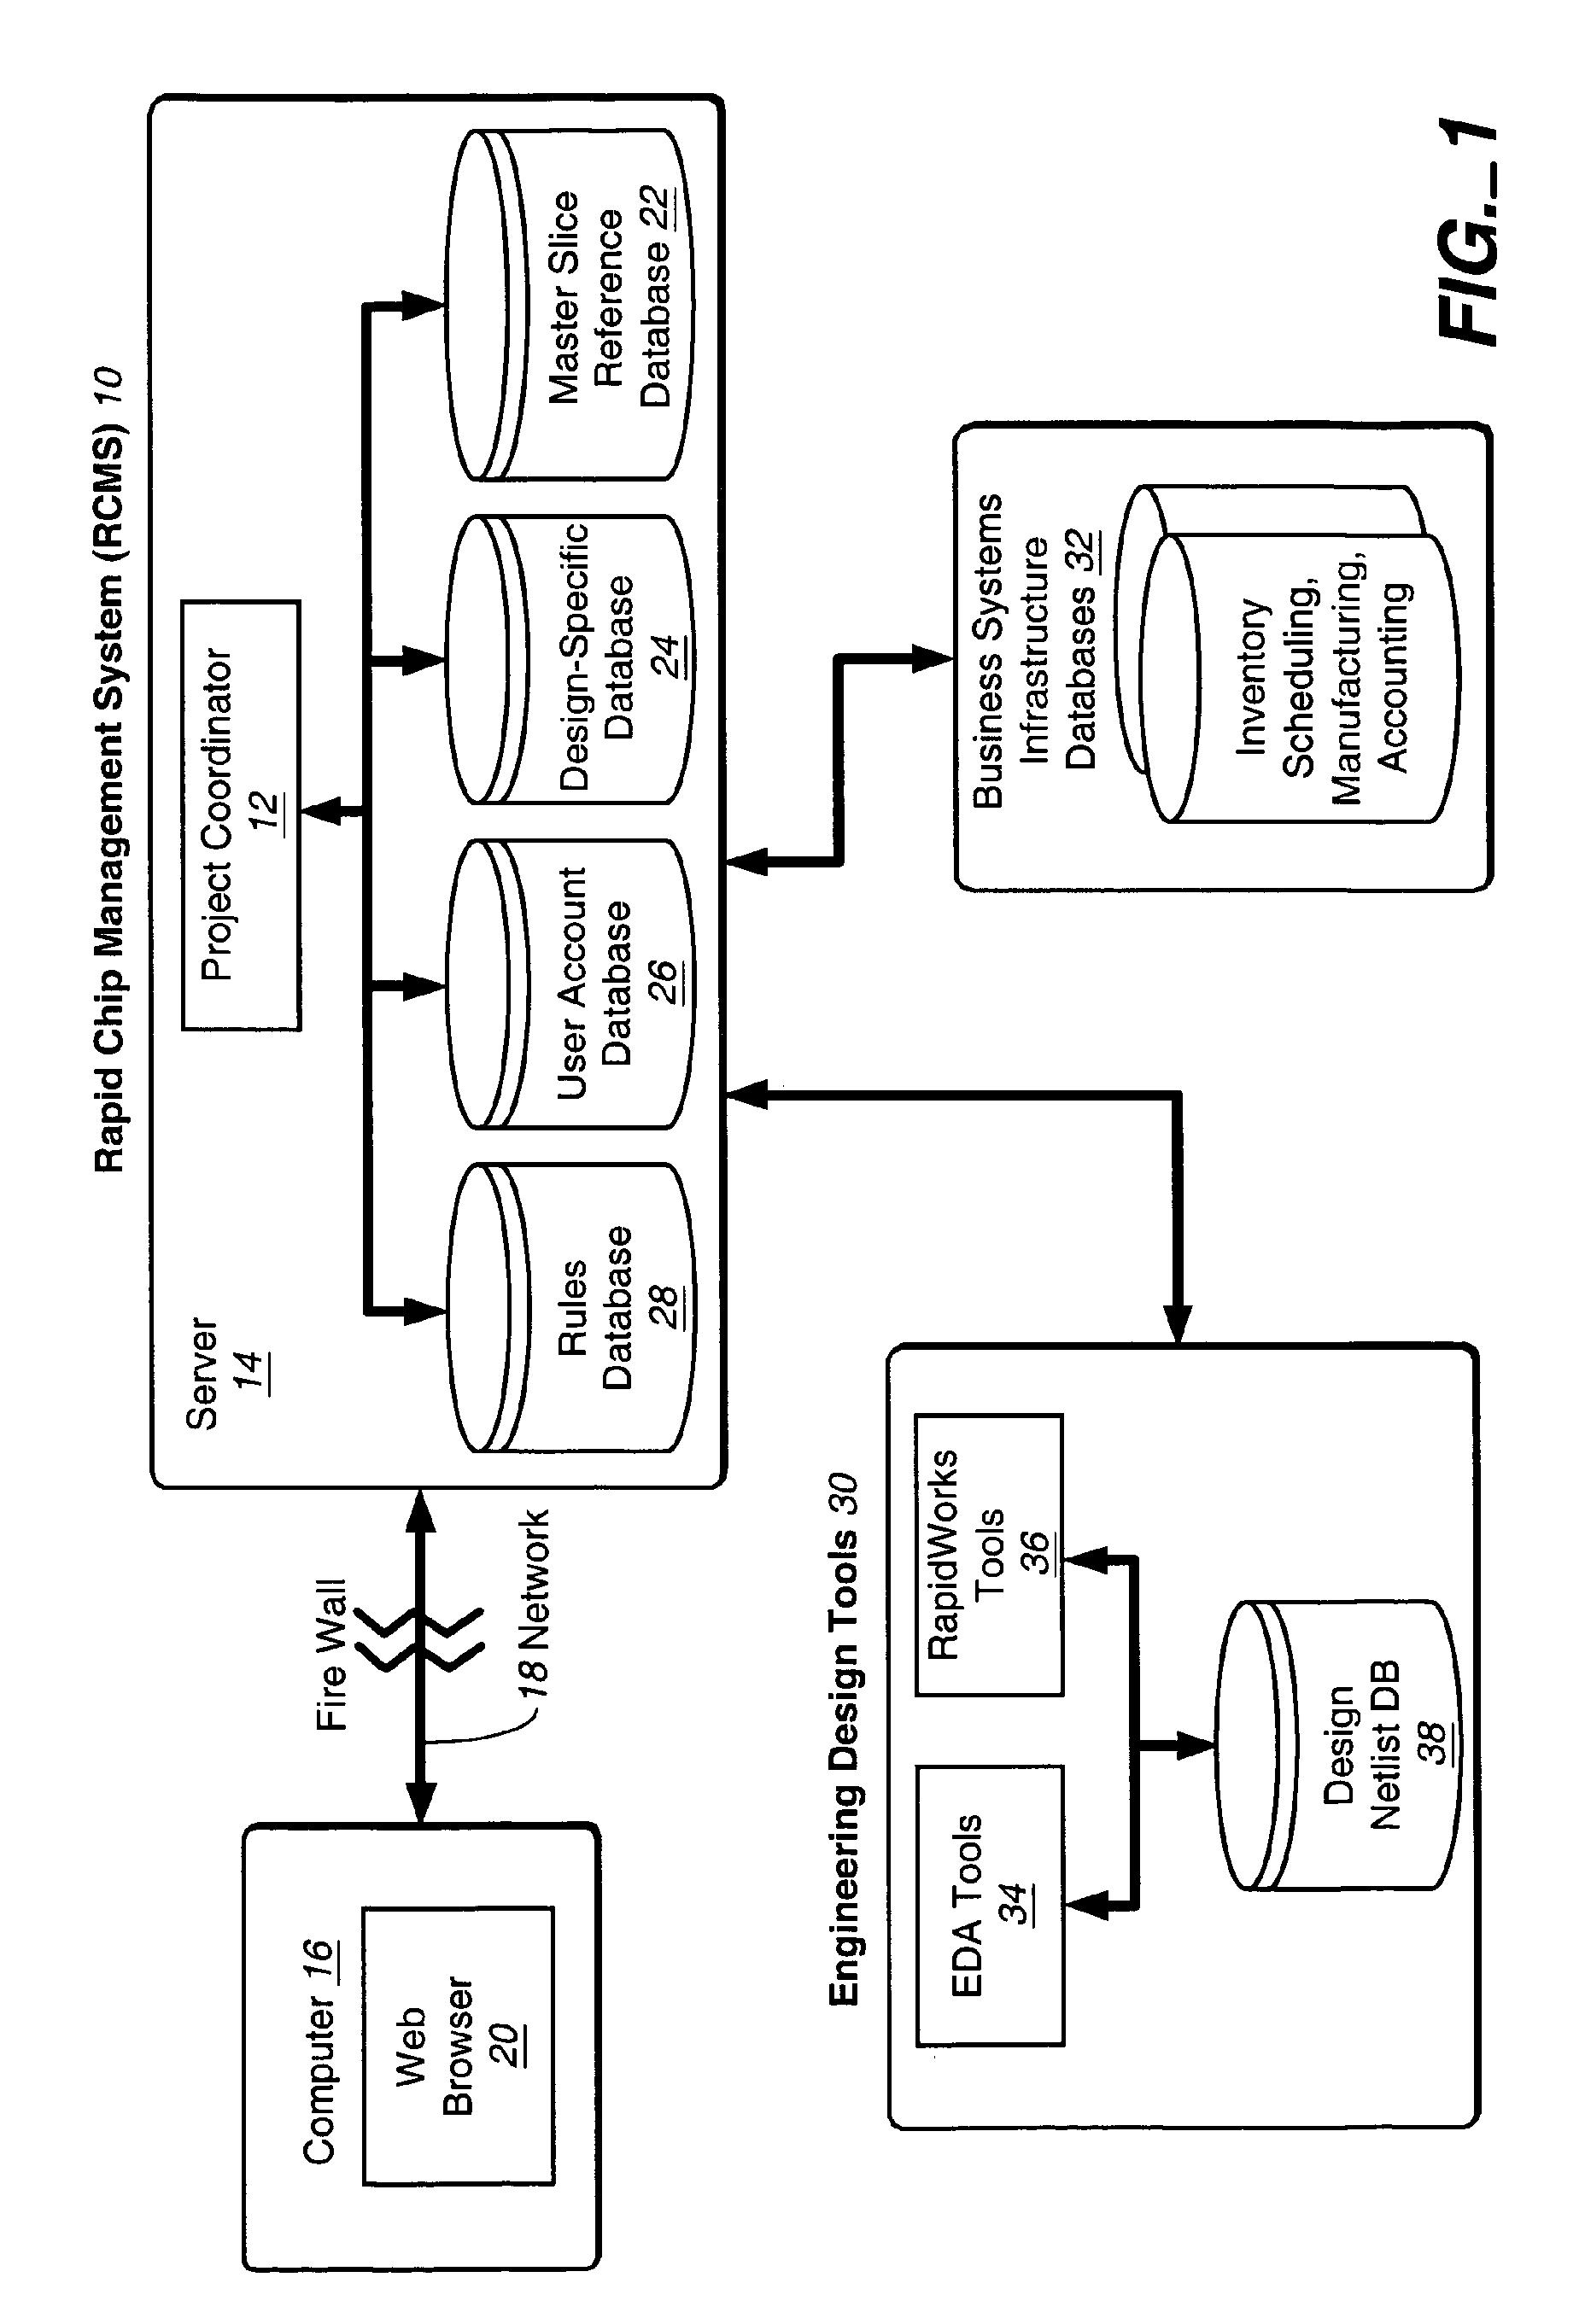 patent ep1441295a2